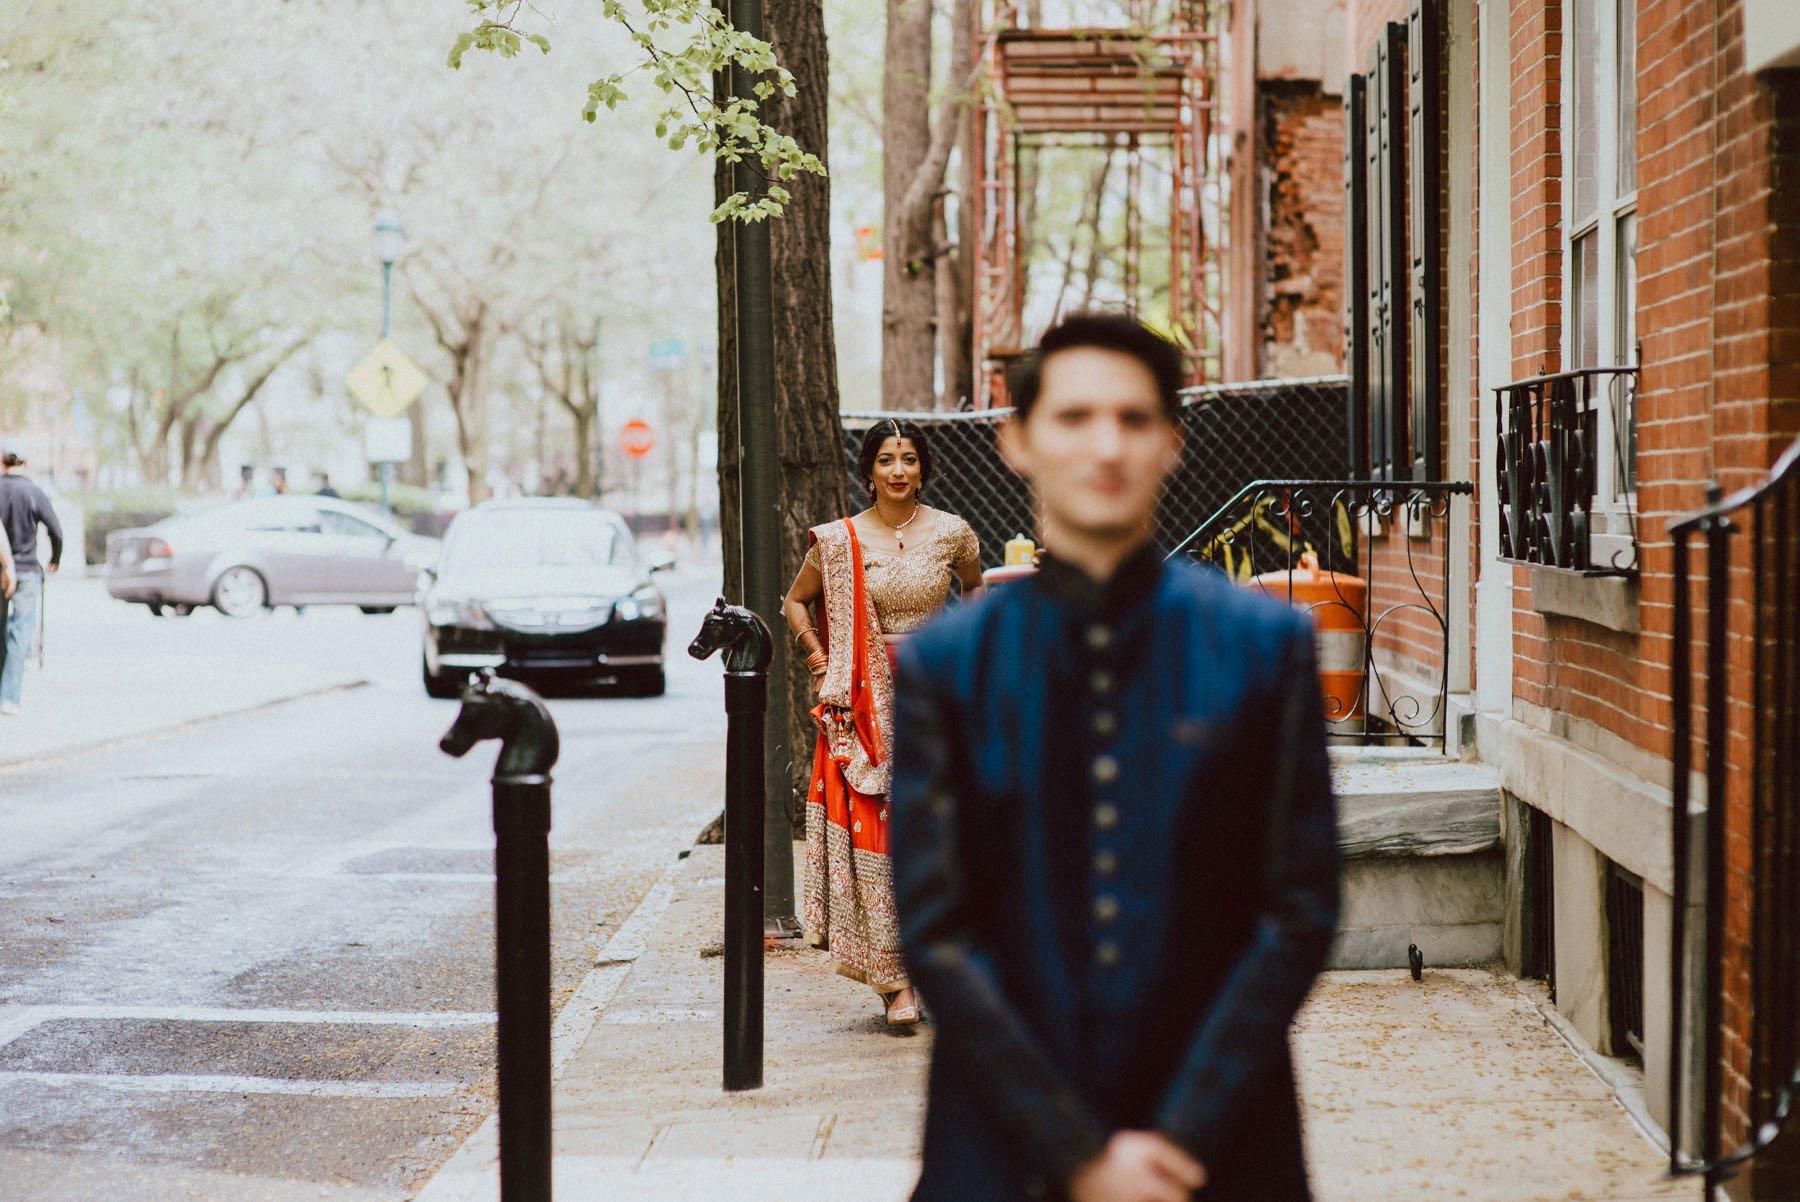 vie-philadelphia-indian-wedding-31.jpg